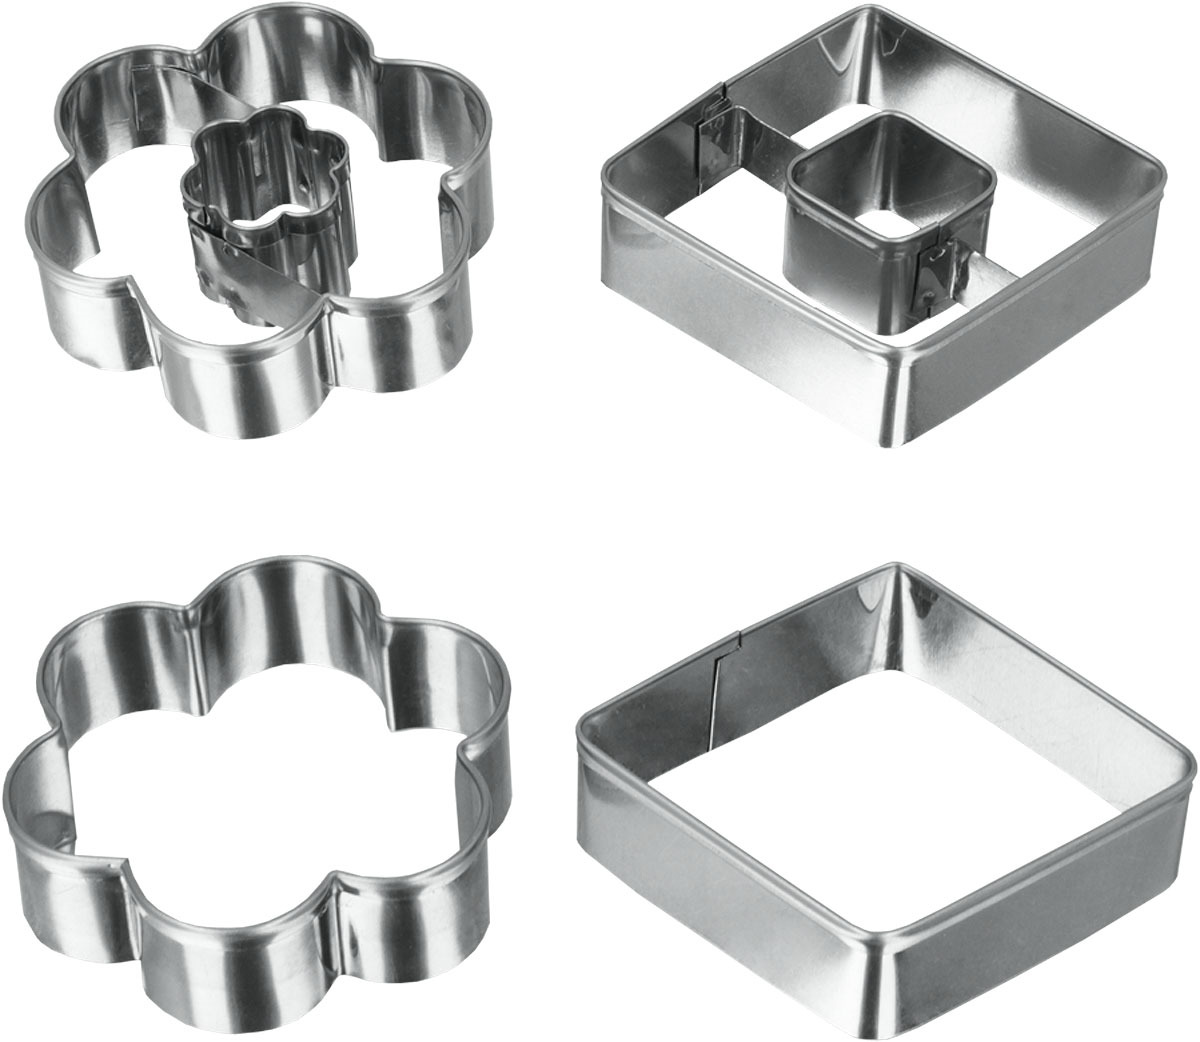 Набор форм для выпечки Metaltex, 2 шт. 25.23.64 набор форм для выпечки metaltex 6 шт 25 91 24